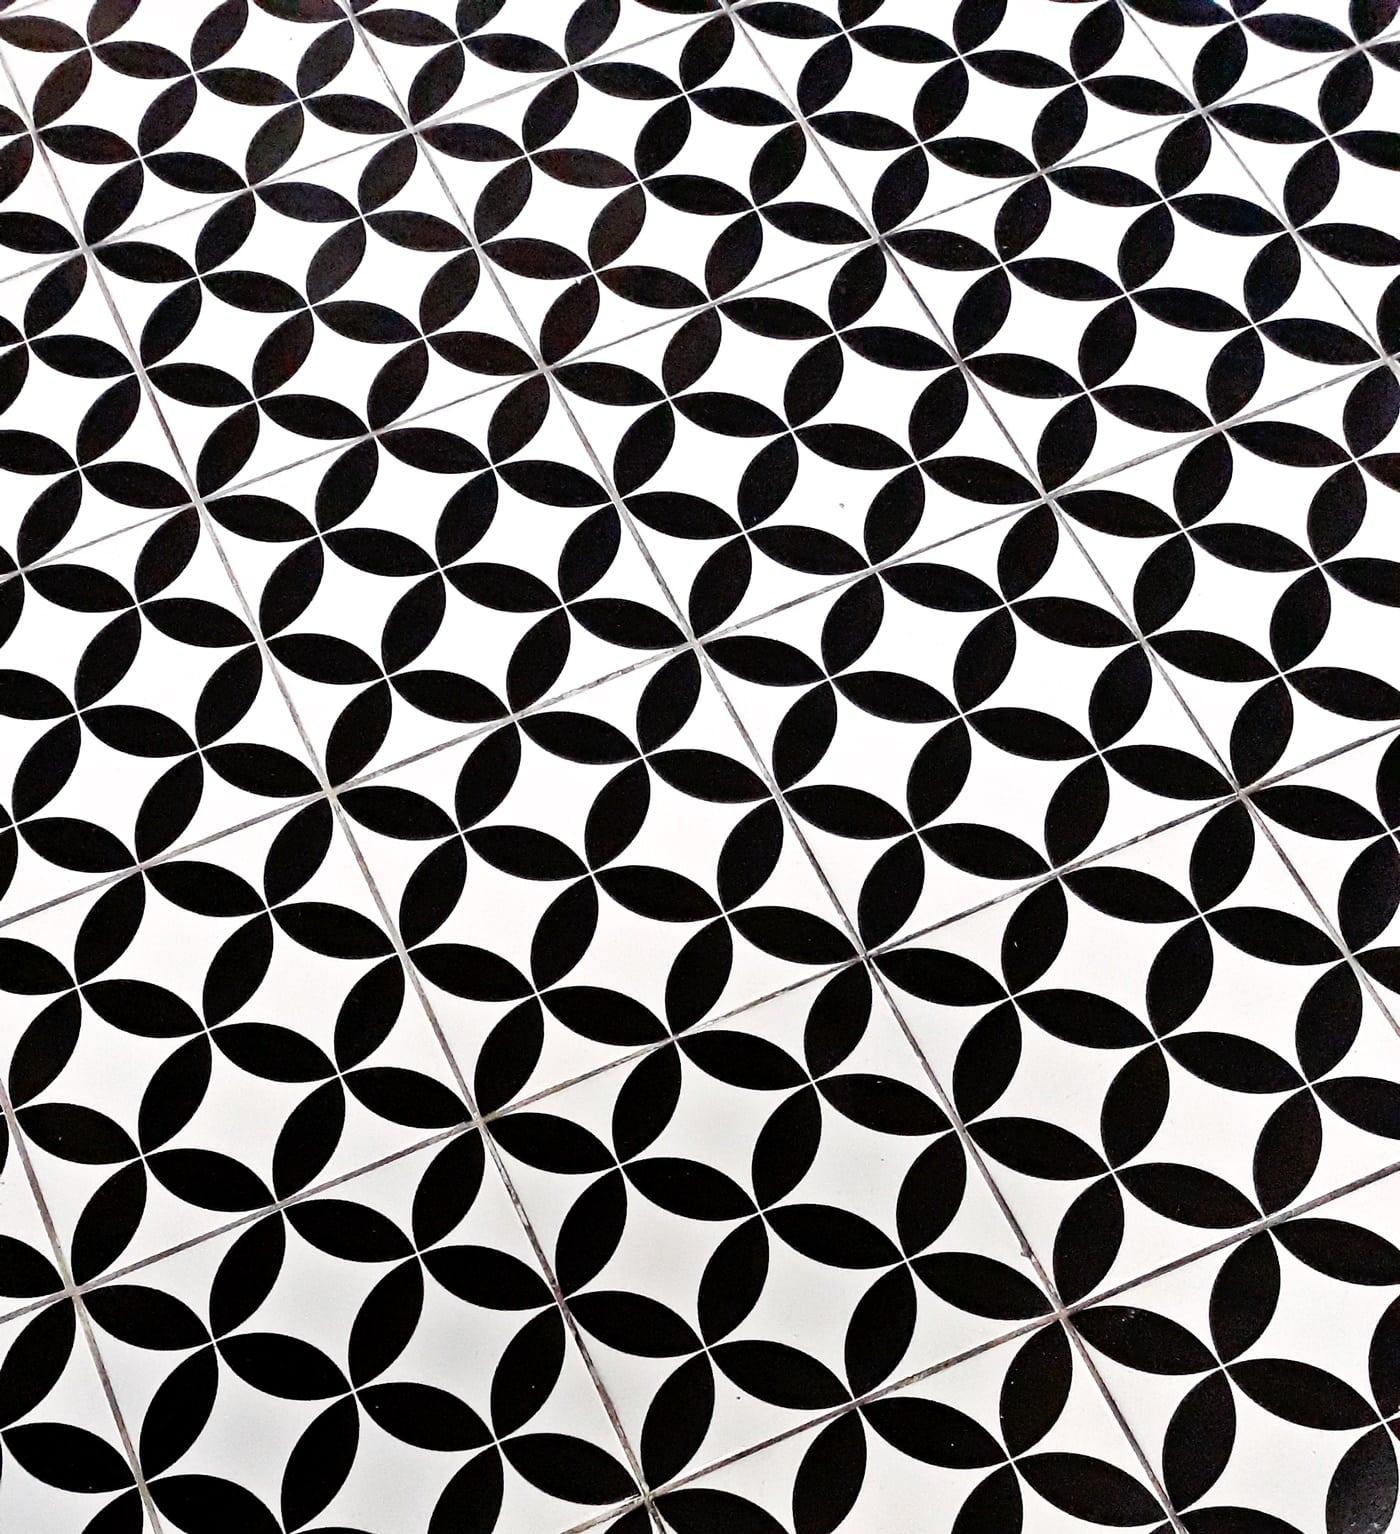 Patterned Floor Tiles, Design, Texture